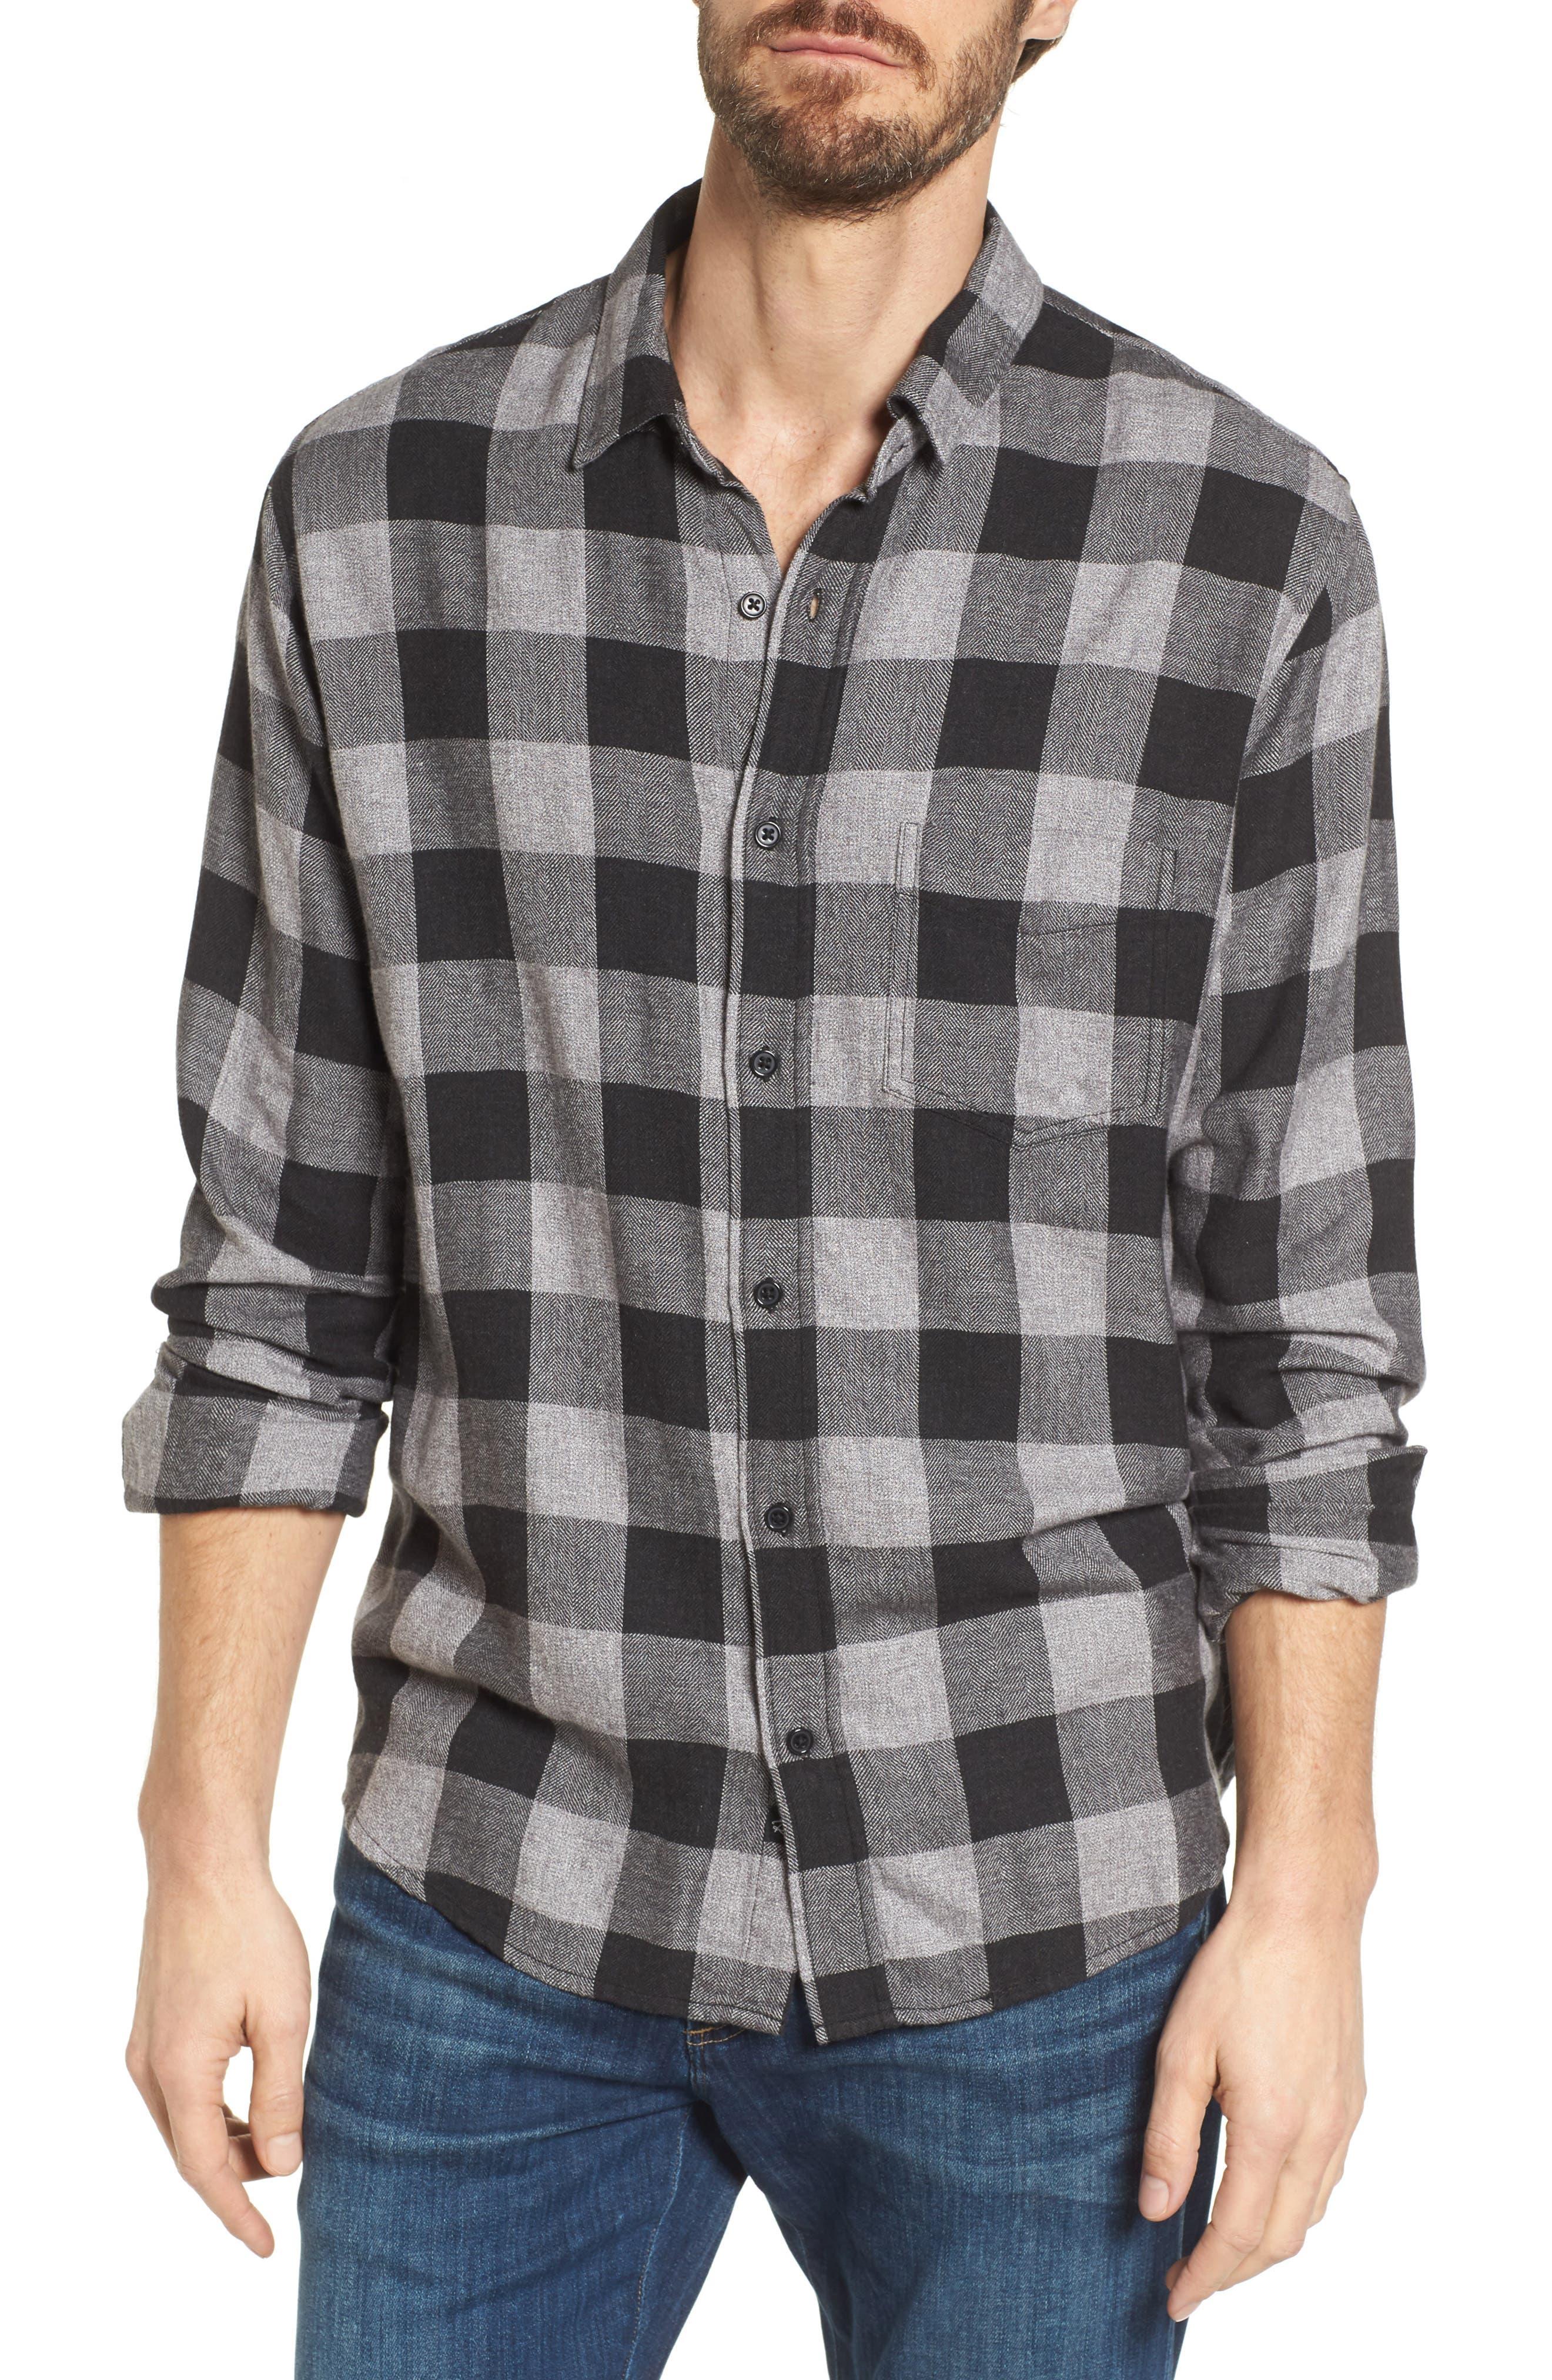 Lennox Sport Shirt,                             Main thumbnail 1, color,                             CHARCOAL/ BLACK CHECK